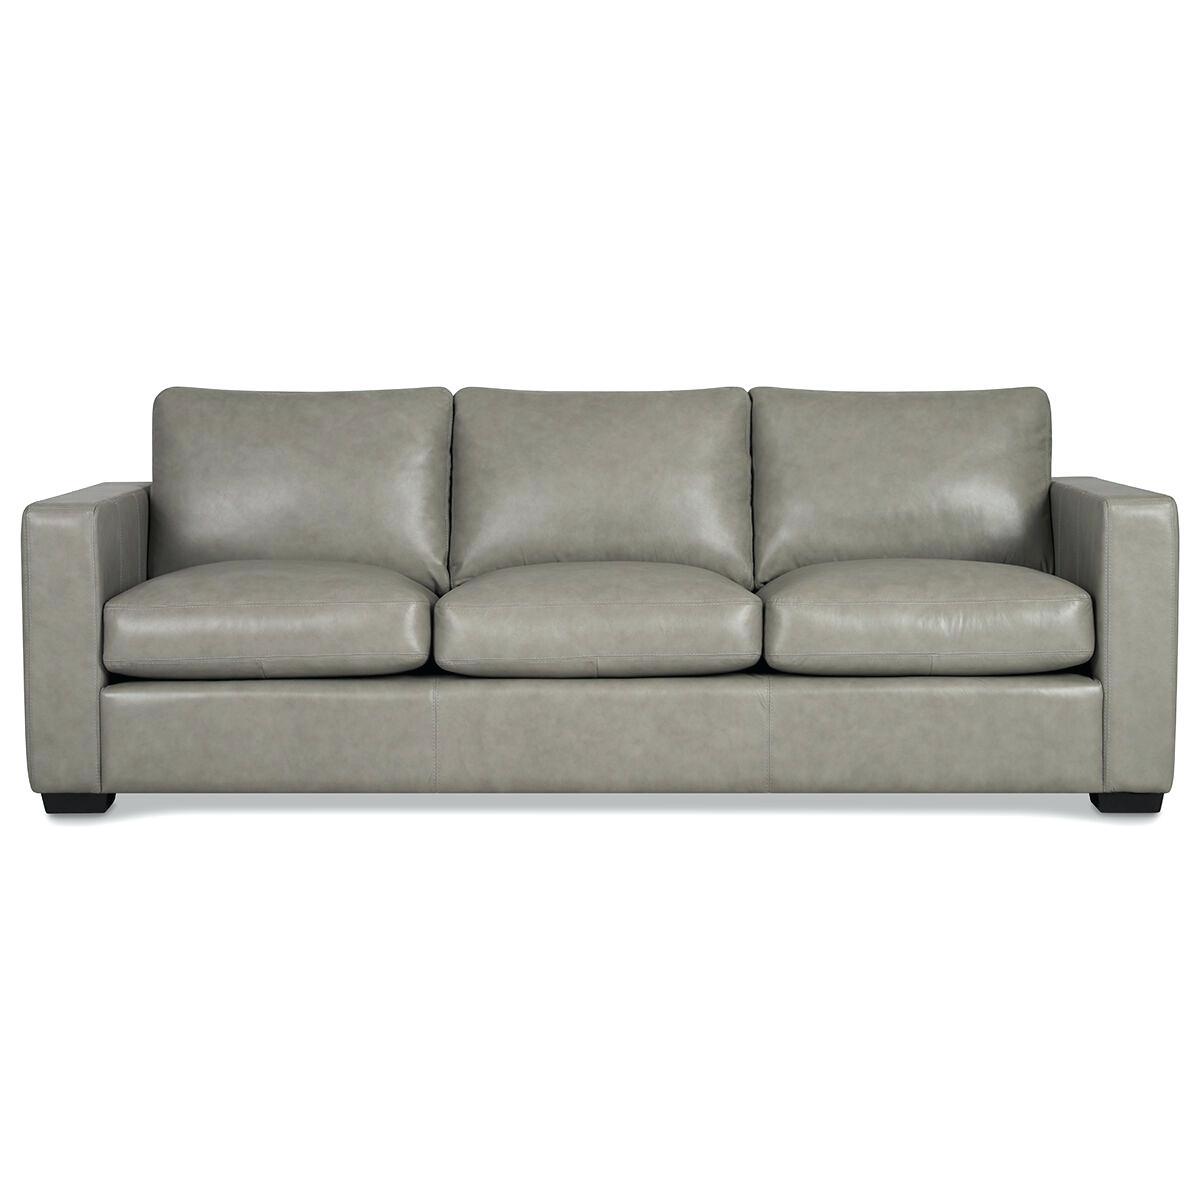 Custom Leather Sofa Matthewfarewellco intended for sizing 1200 X 1200